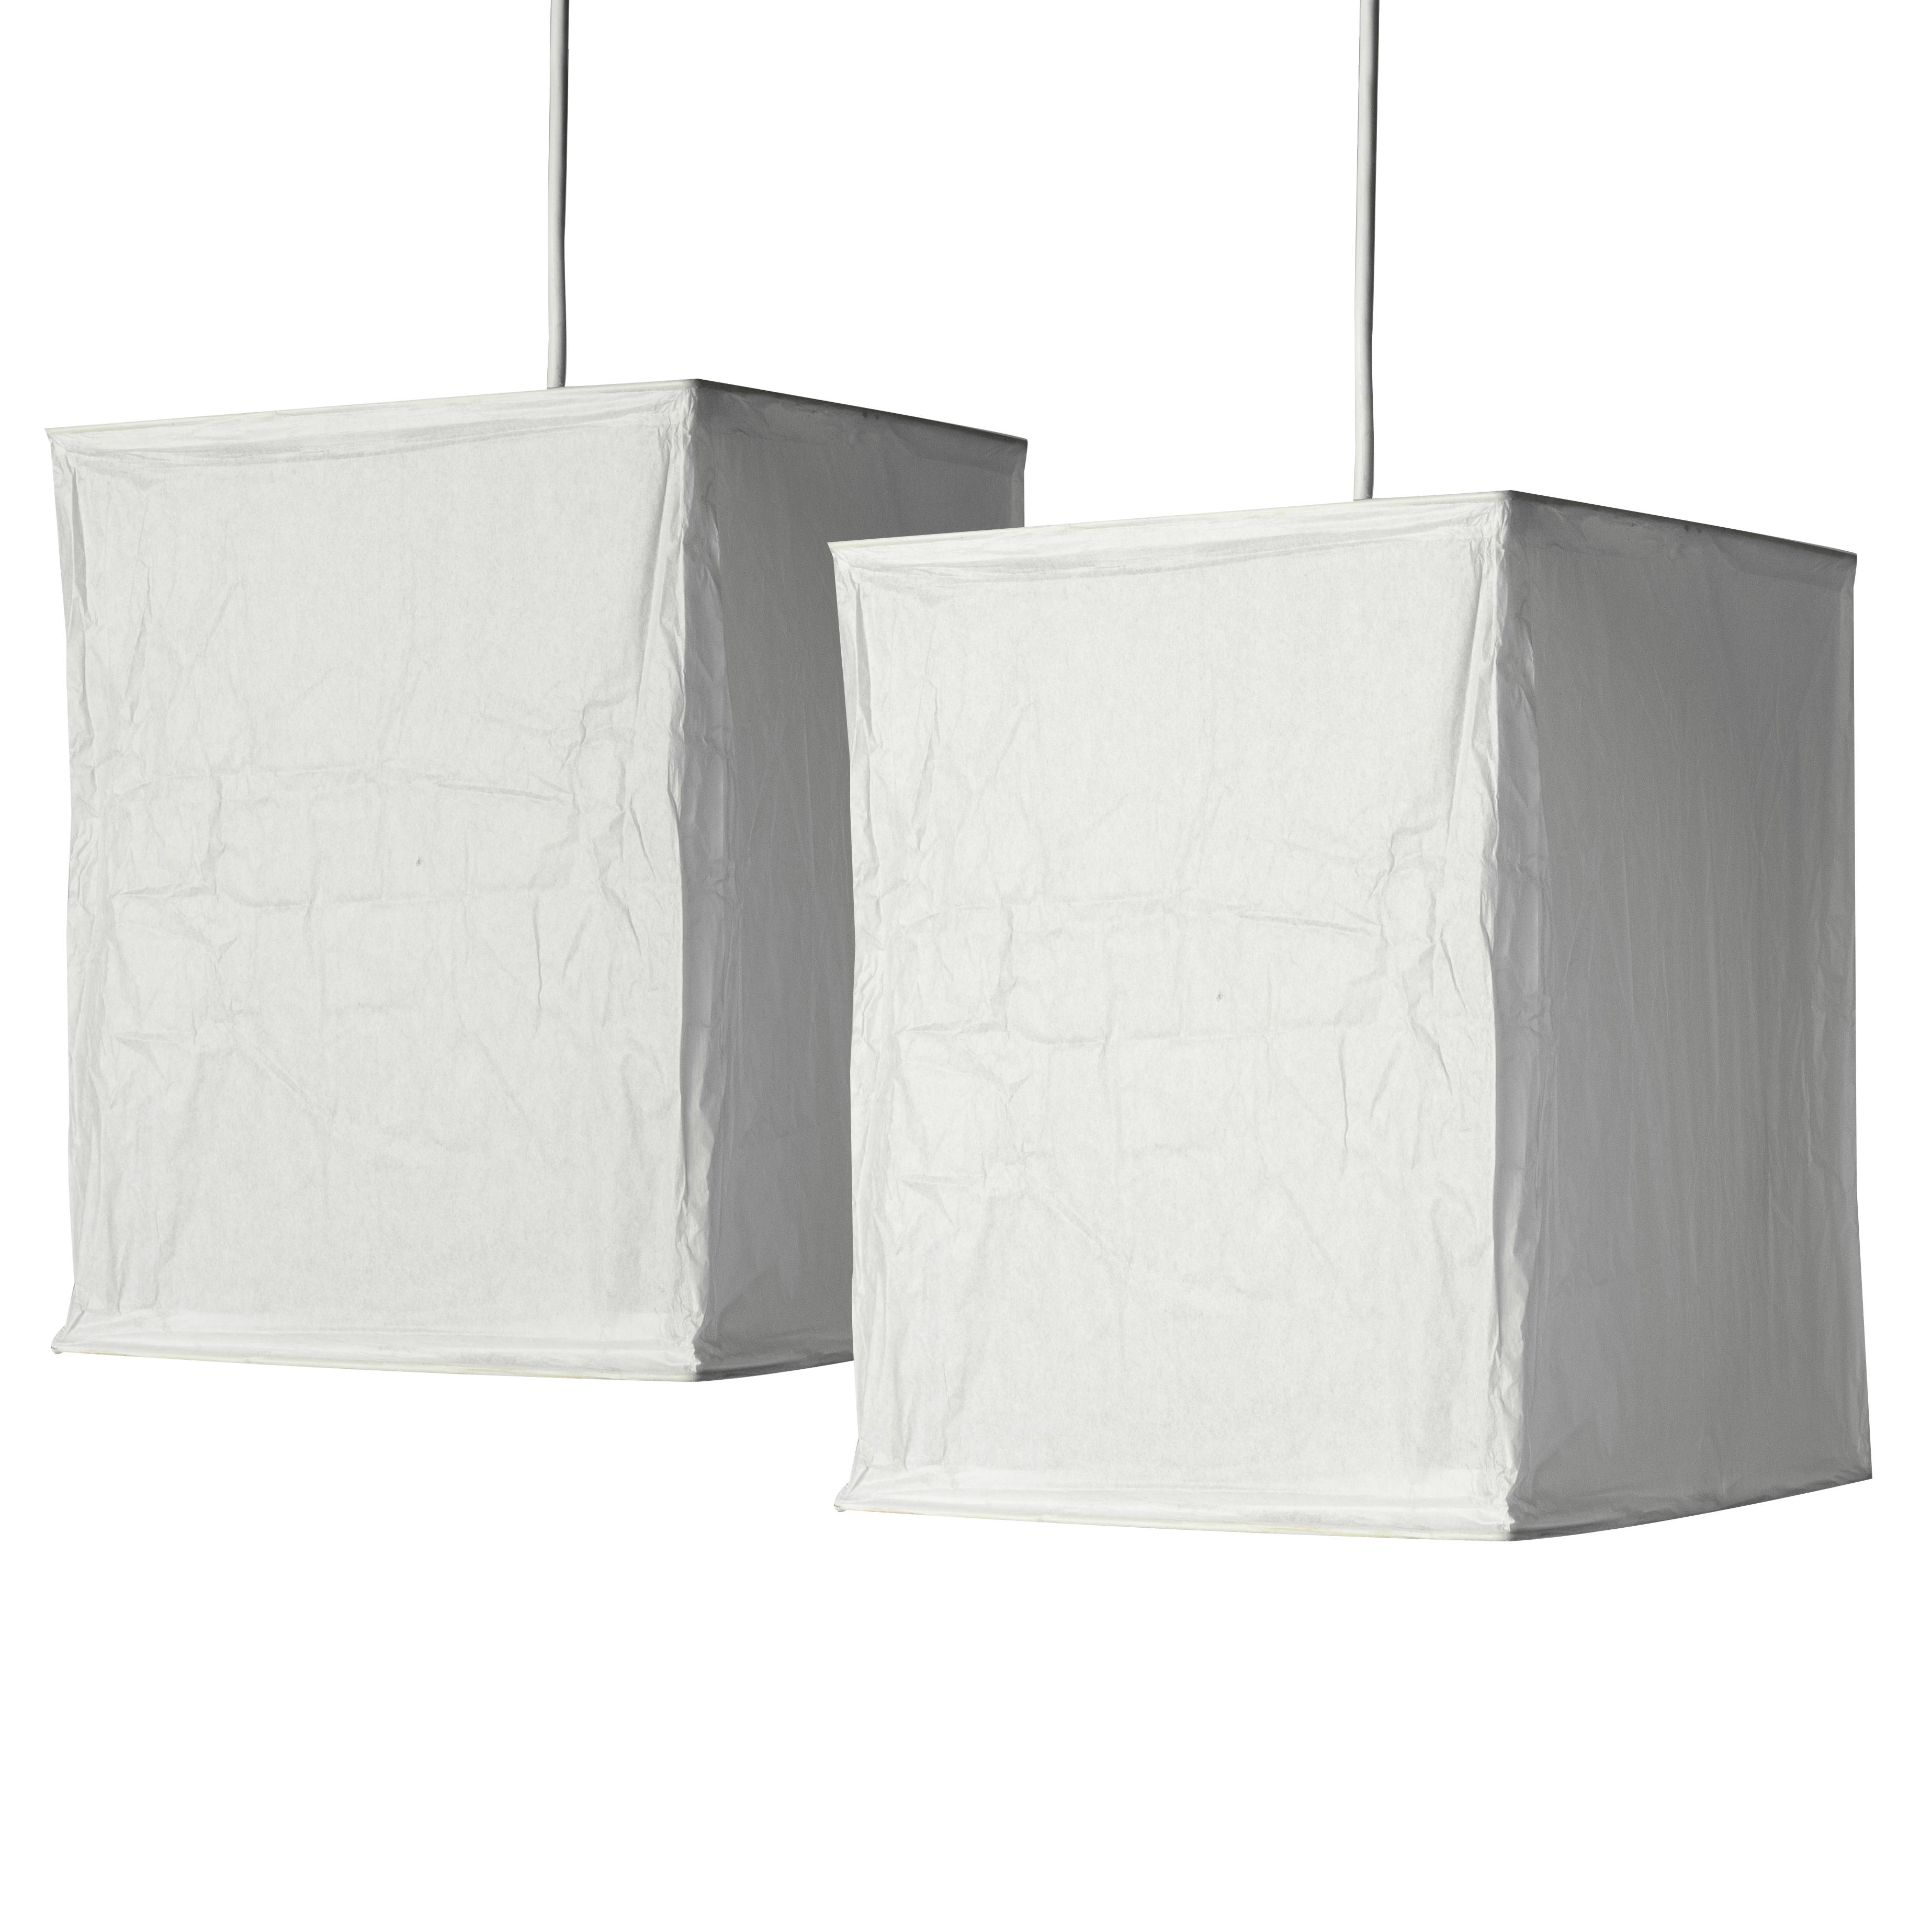 Pair Of Modern White Rice Paper Cube Lantern Ceiling